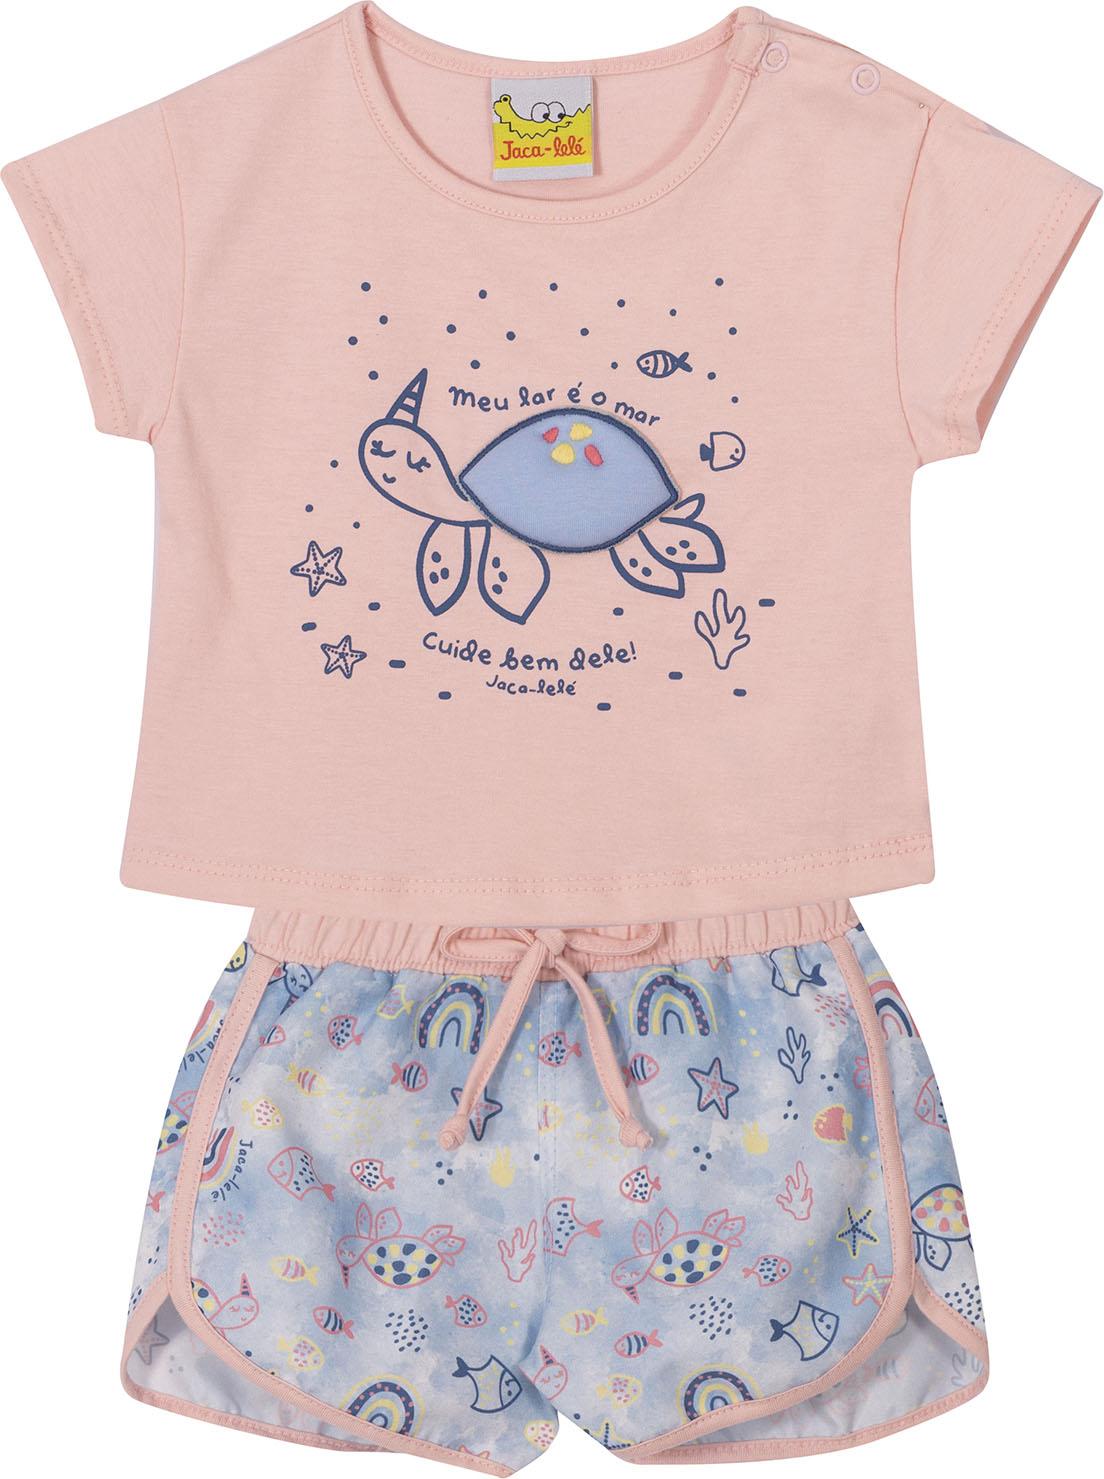 Conjunto Infantil Blusa Cropped e Shorts JACA-LELÉ Tartaruga Rosa e Azul